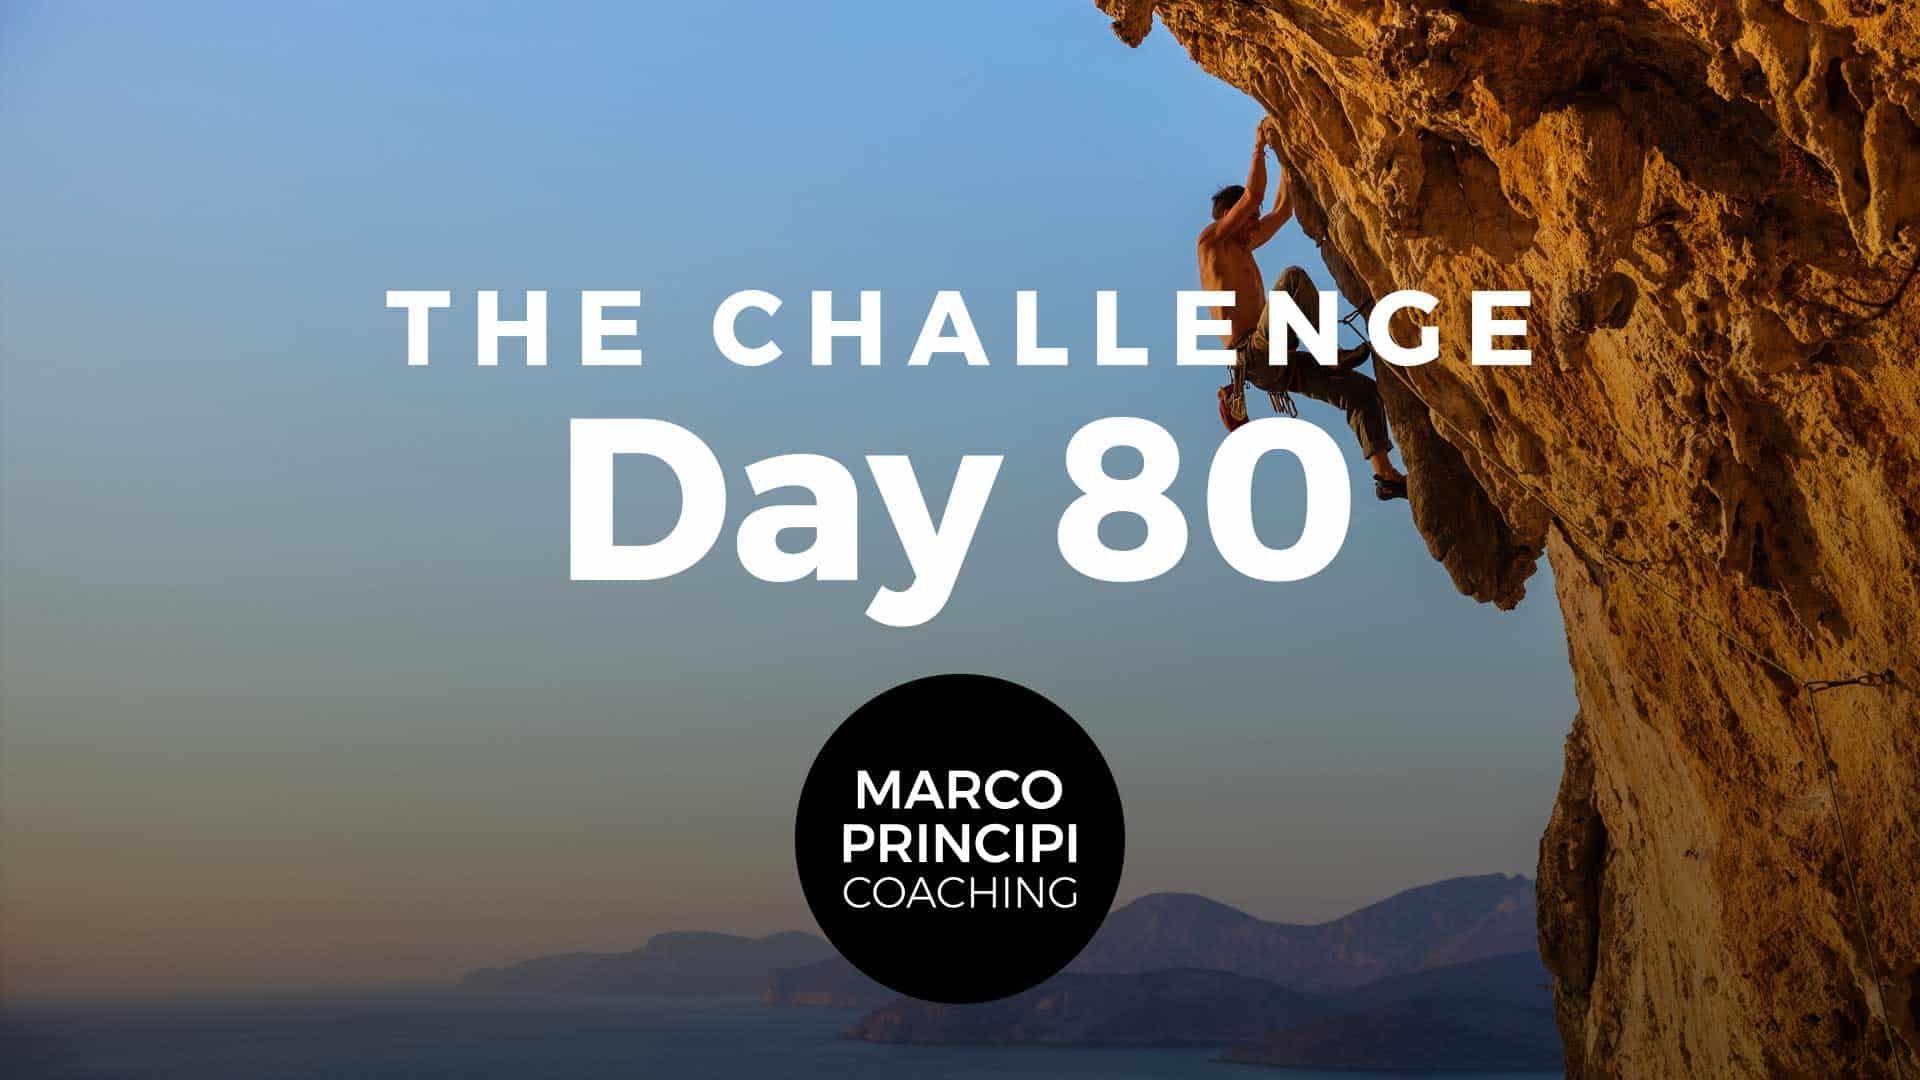 Marco Principi Coaching Challenge Day 80